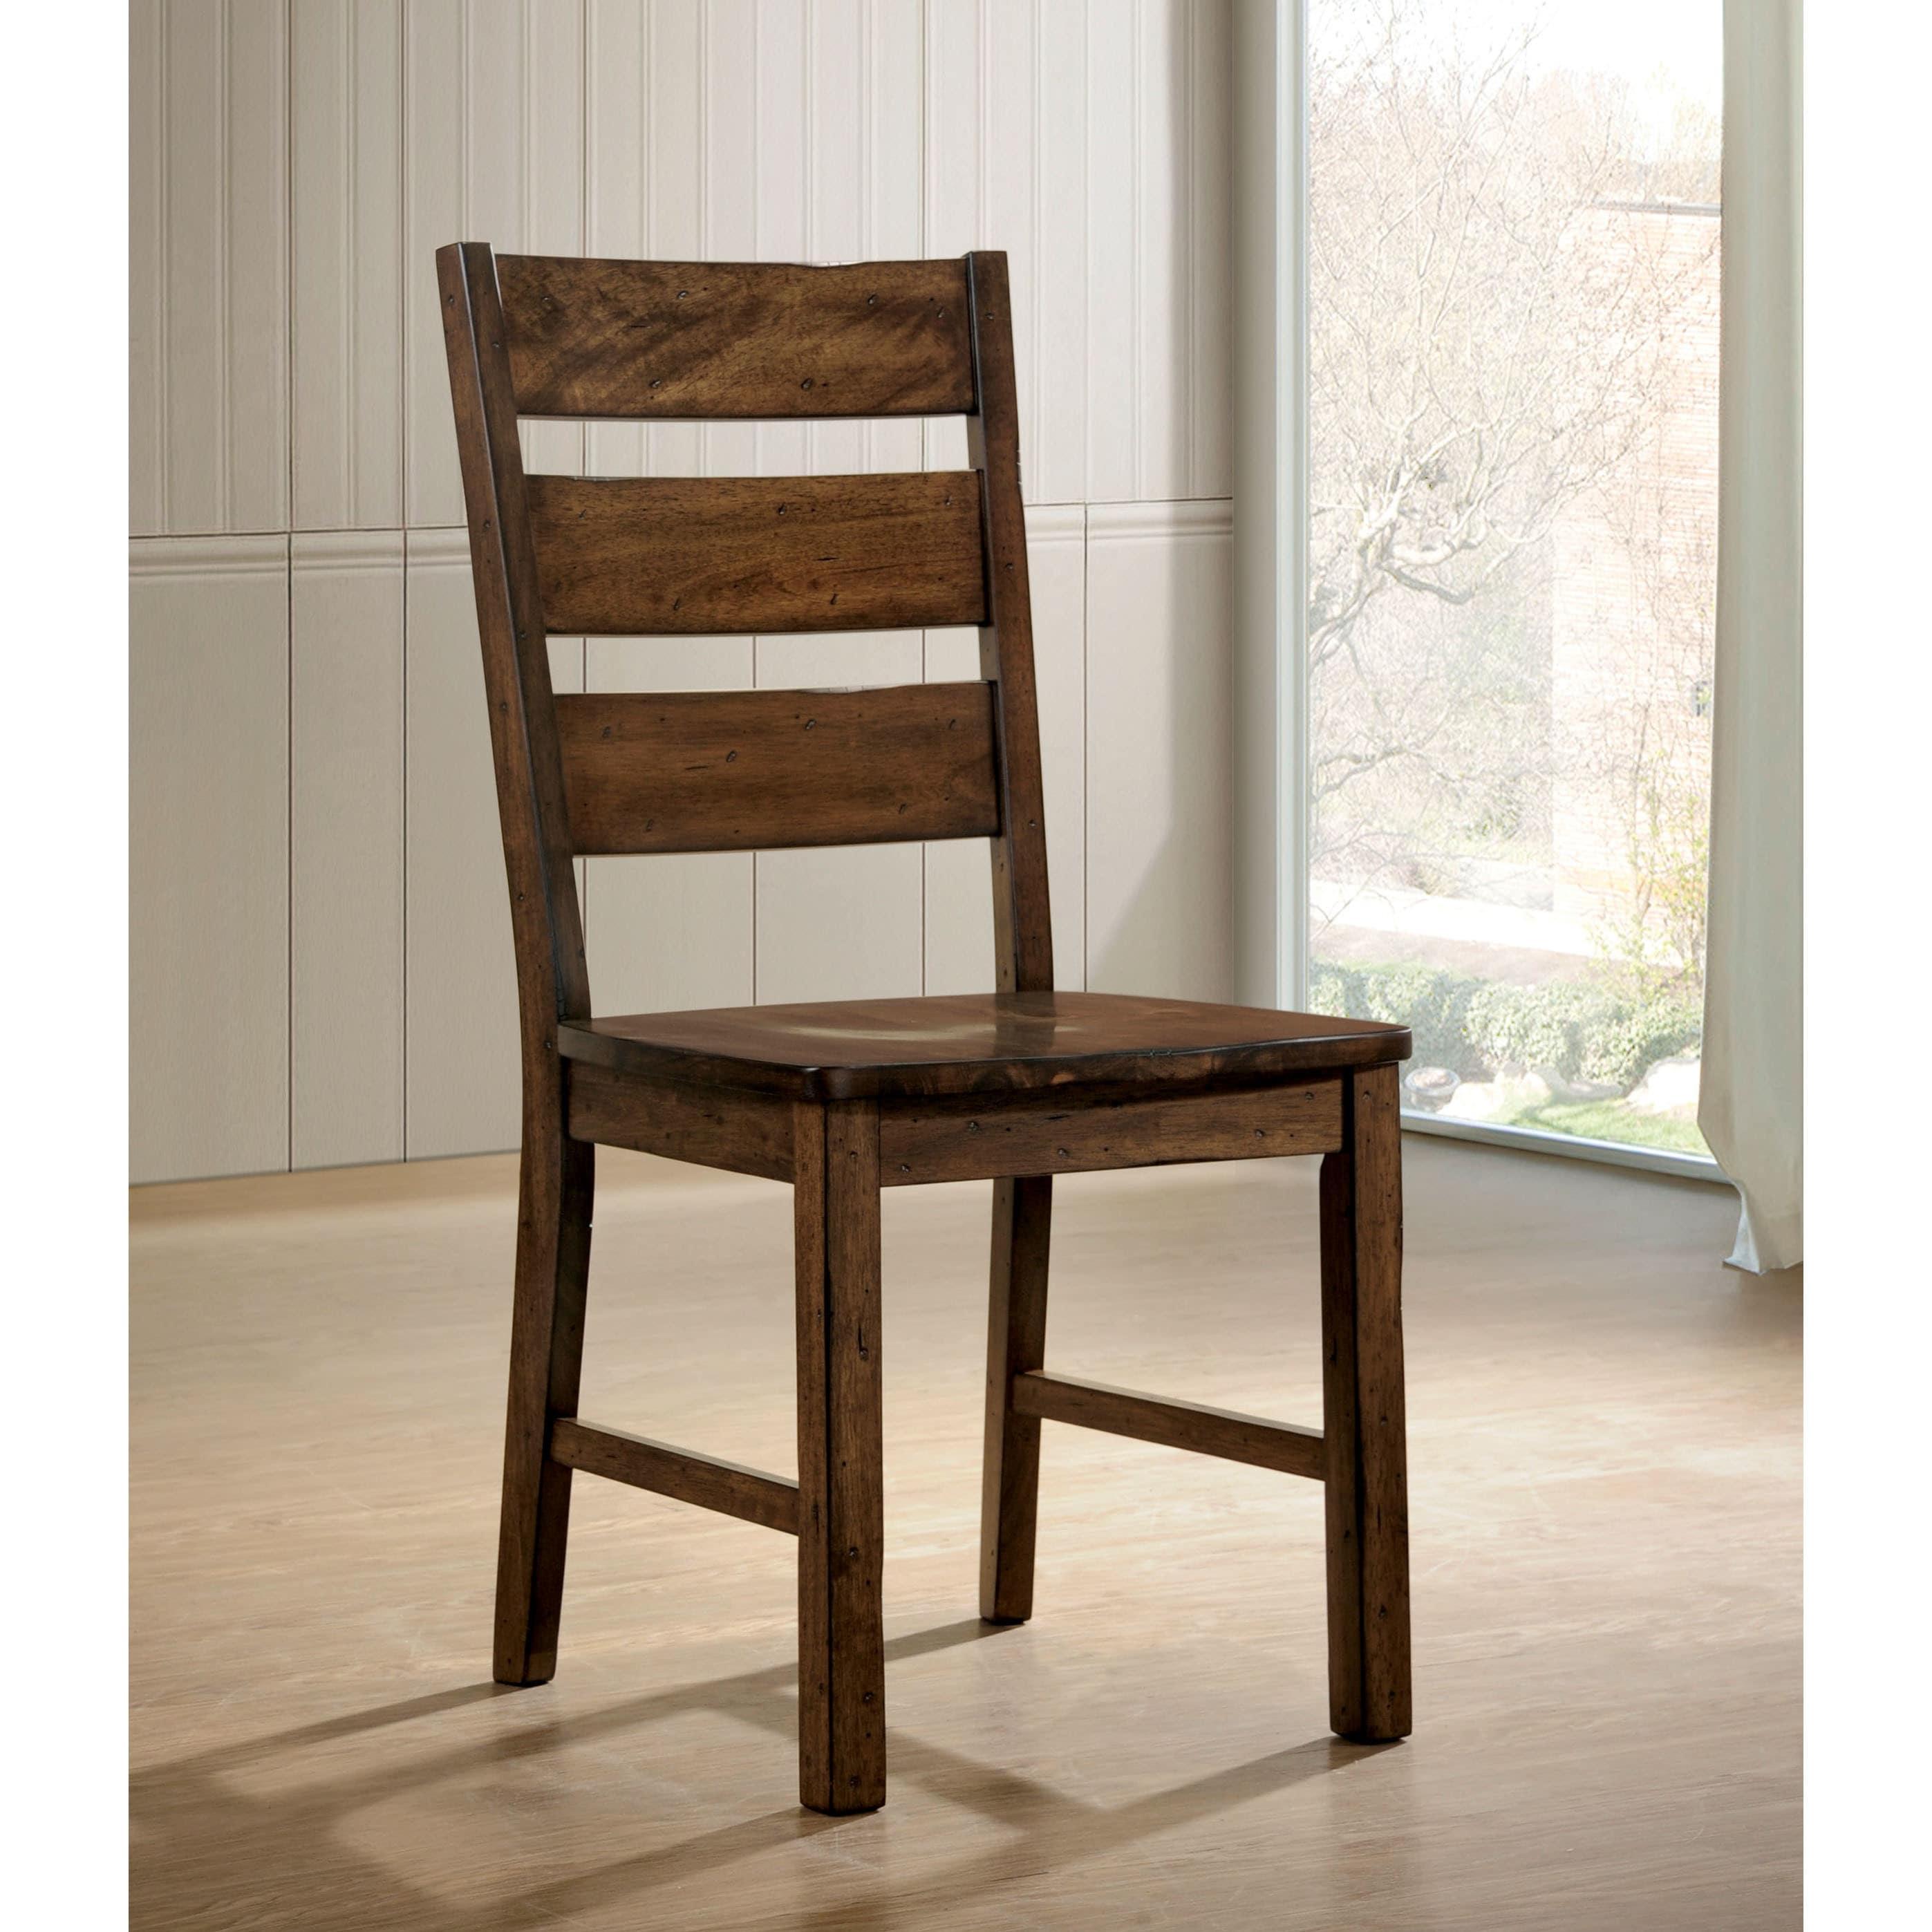 Terele Rustic Walnut Dining Chairs Set Of 2 By Foa